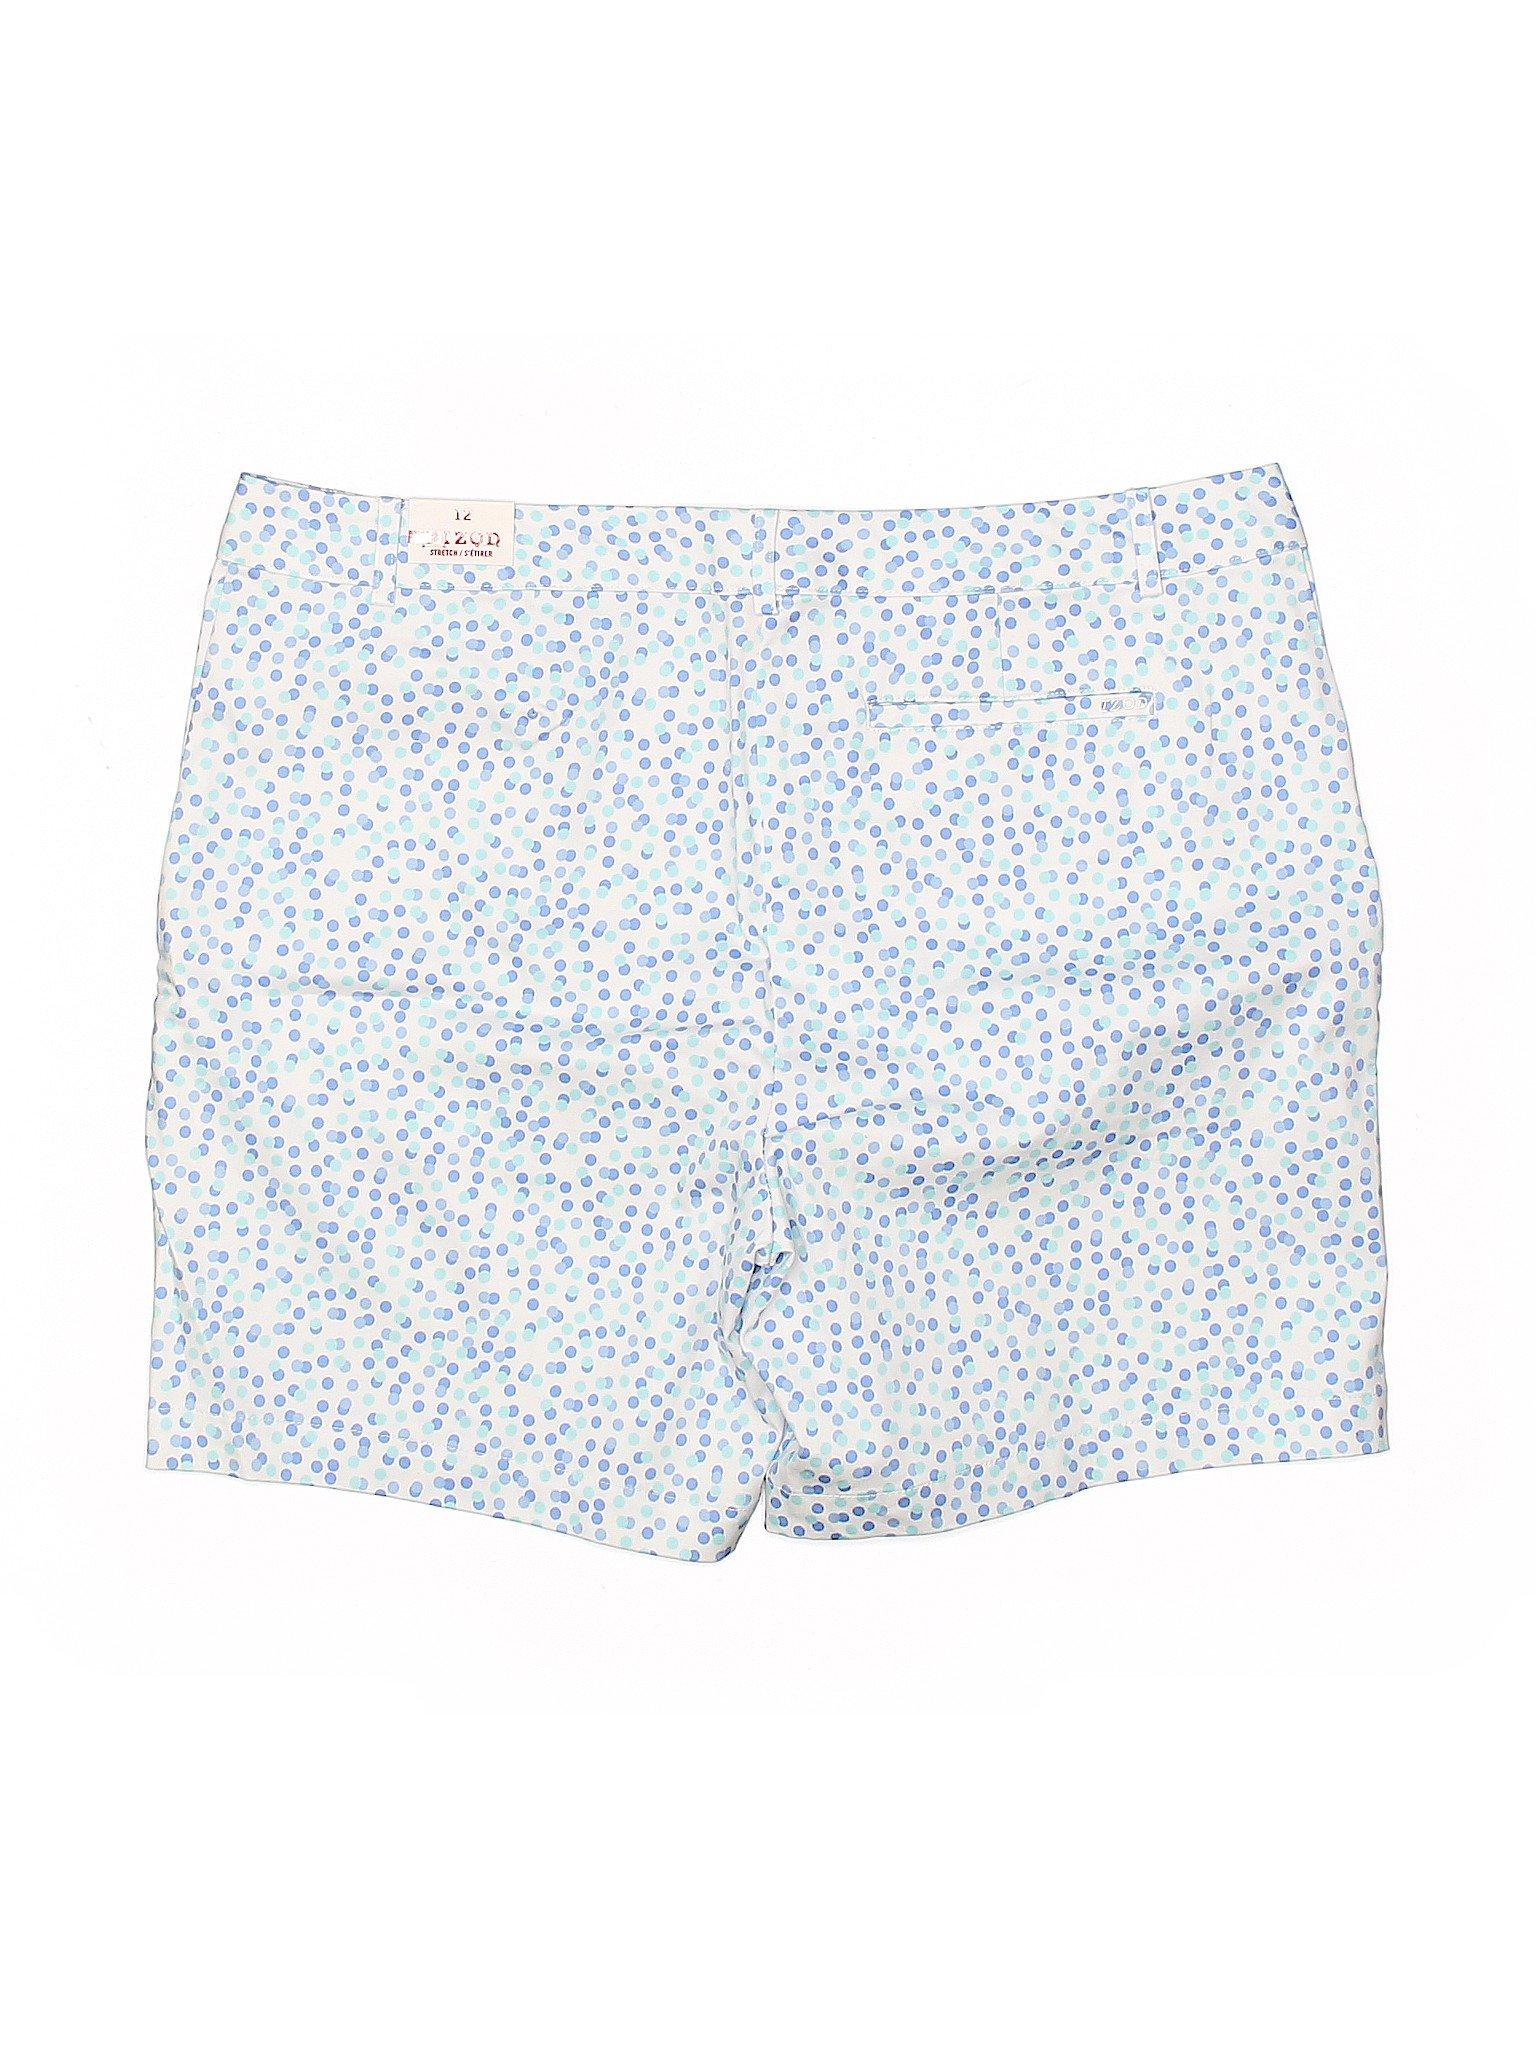 Khaki Boutique Shorts Khaki Boutique IZOD IZOD Boutique Khaki Shorts IZOD Hq1fXxIaw